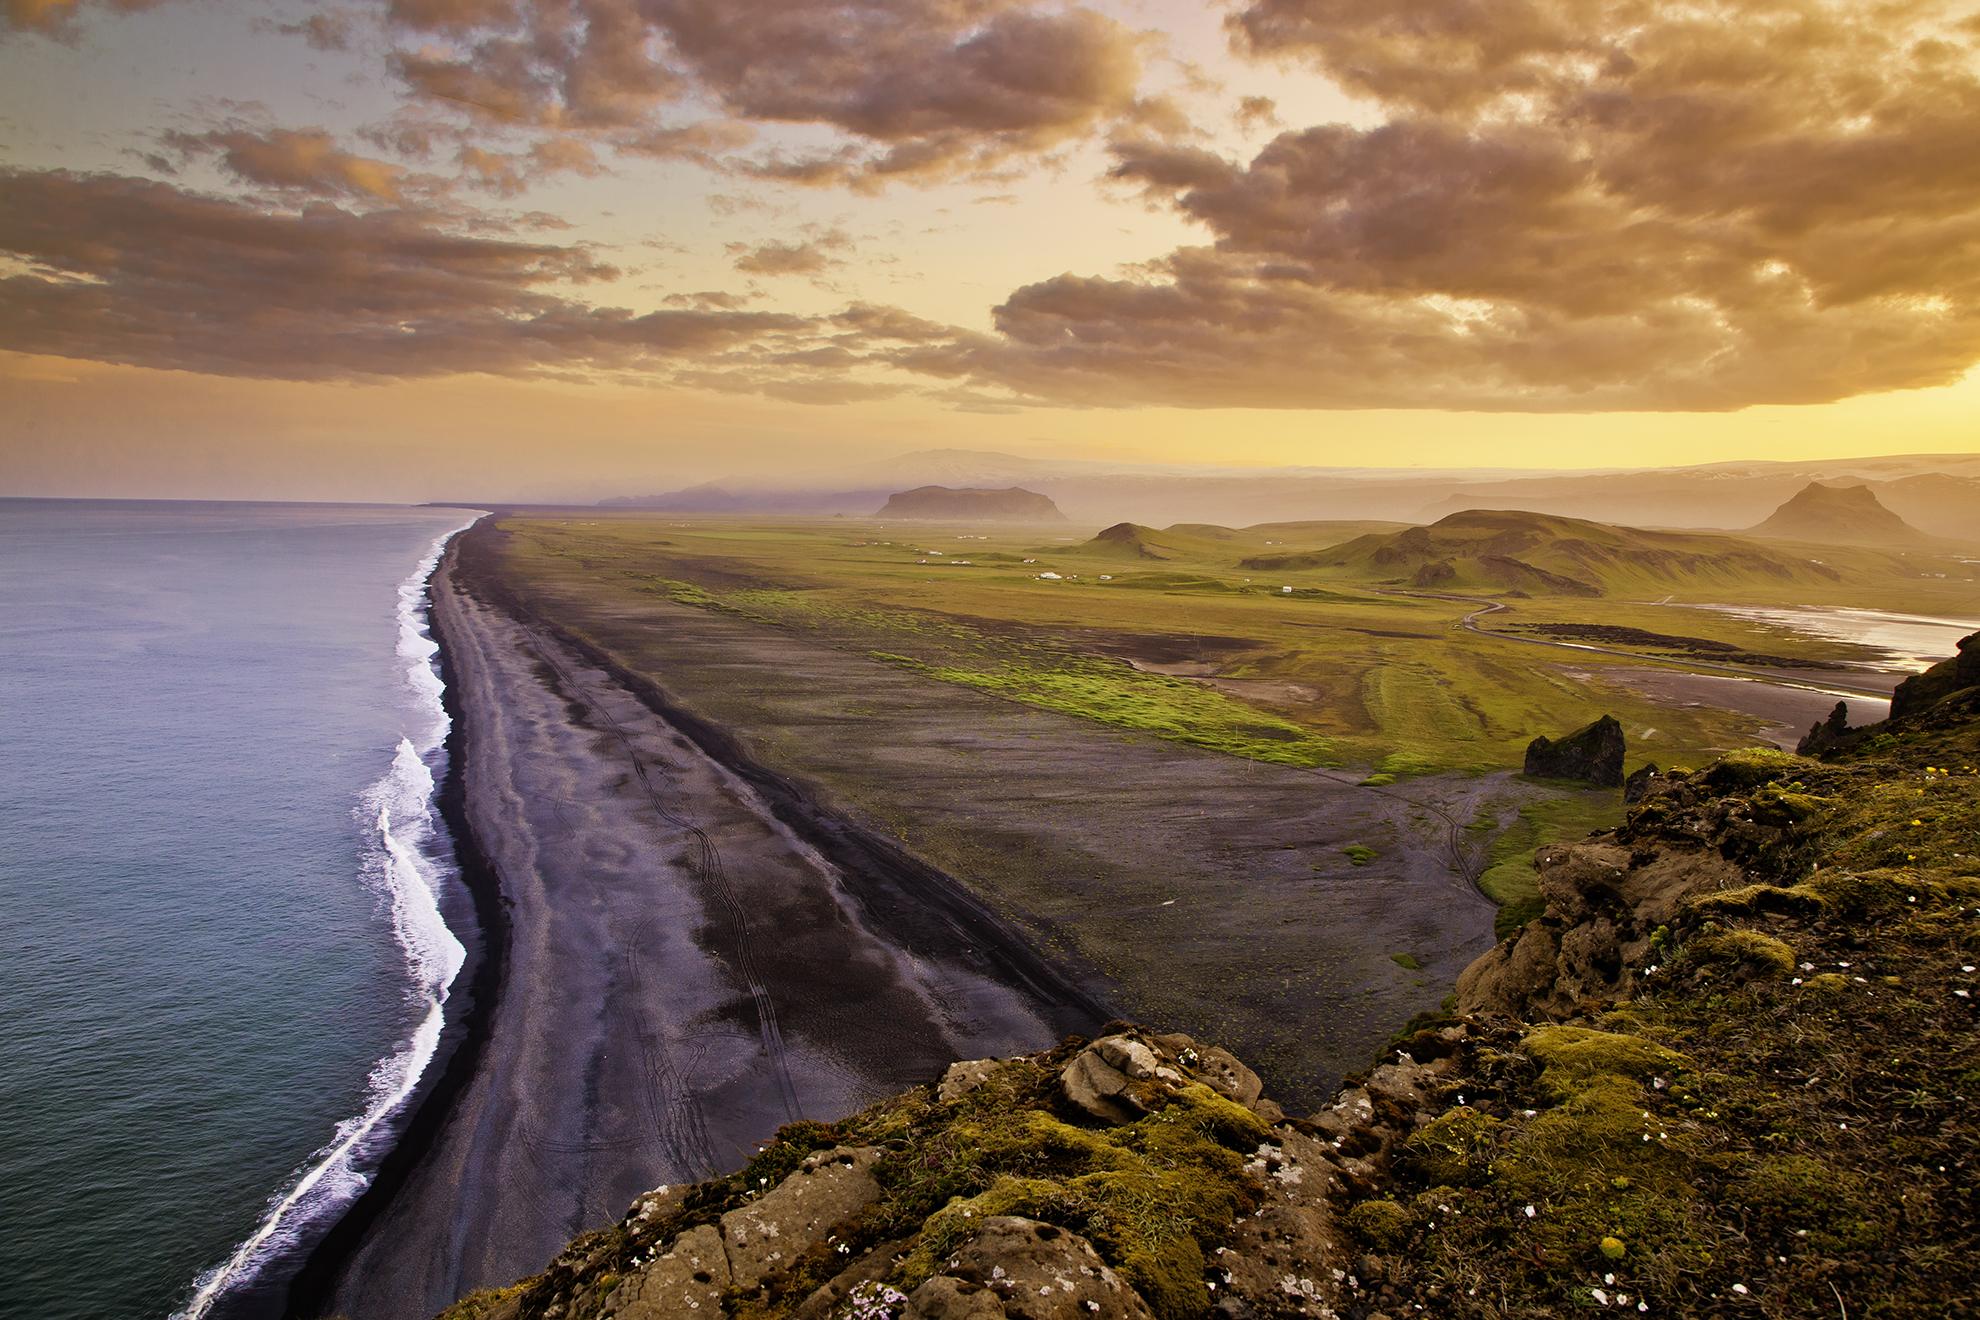 Helicopter Iceland Landscape Atlantik DMC Incentive Cruise Conference PCO.jpg